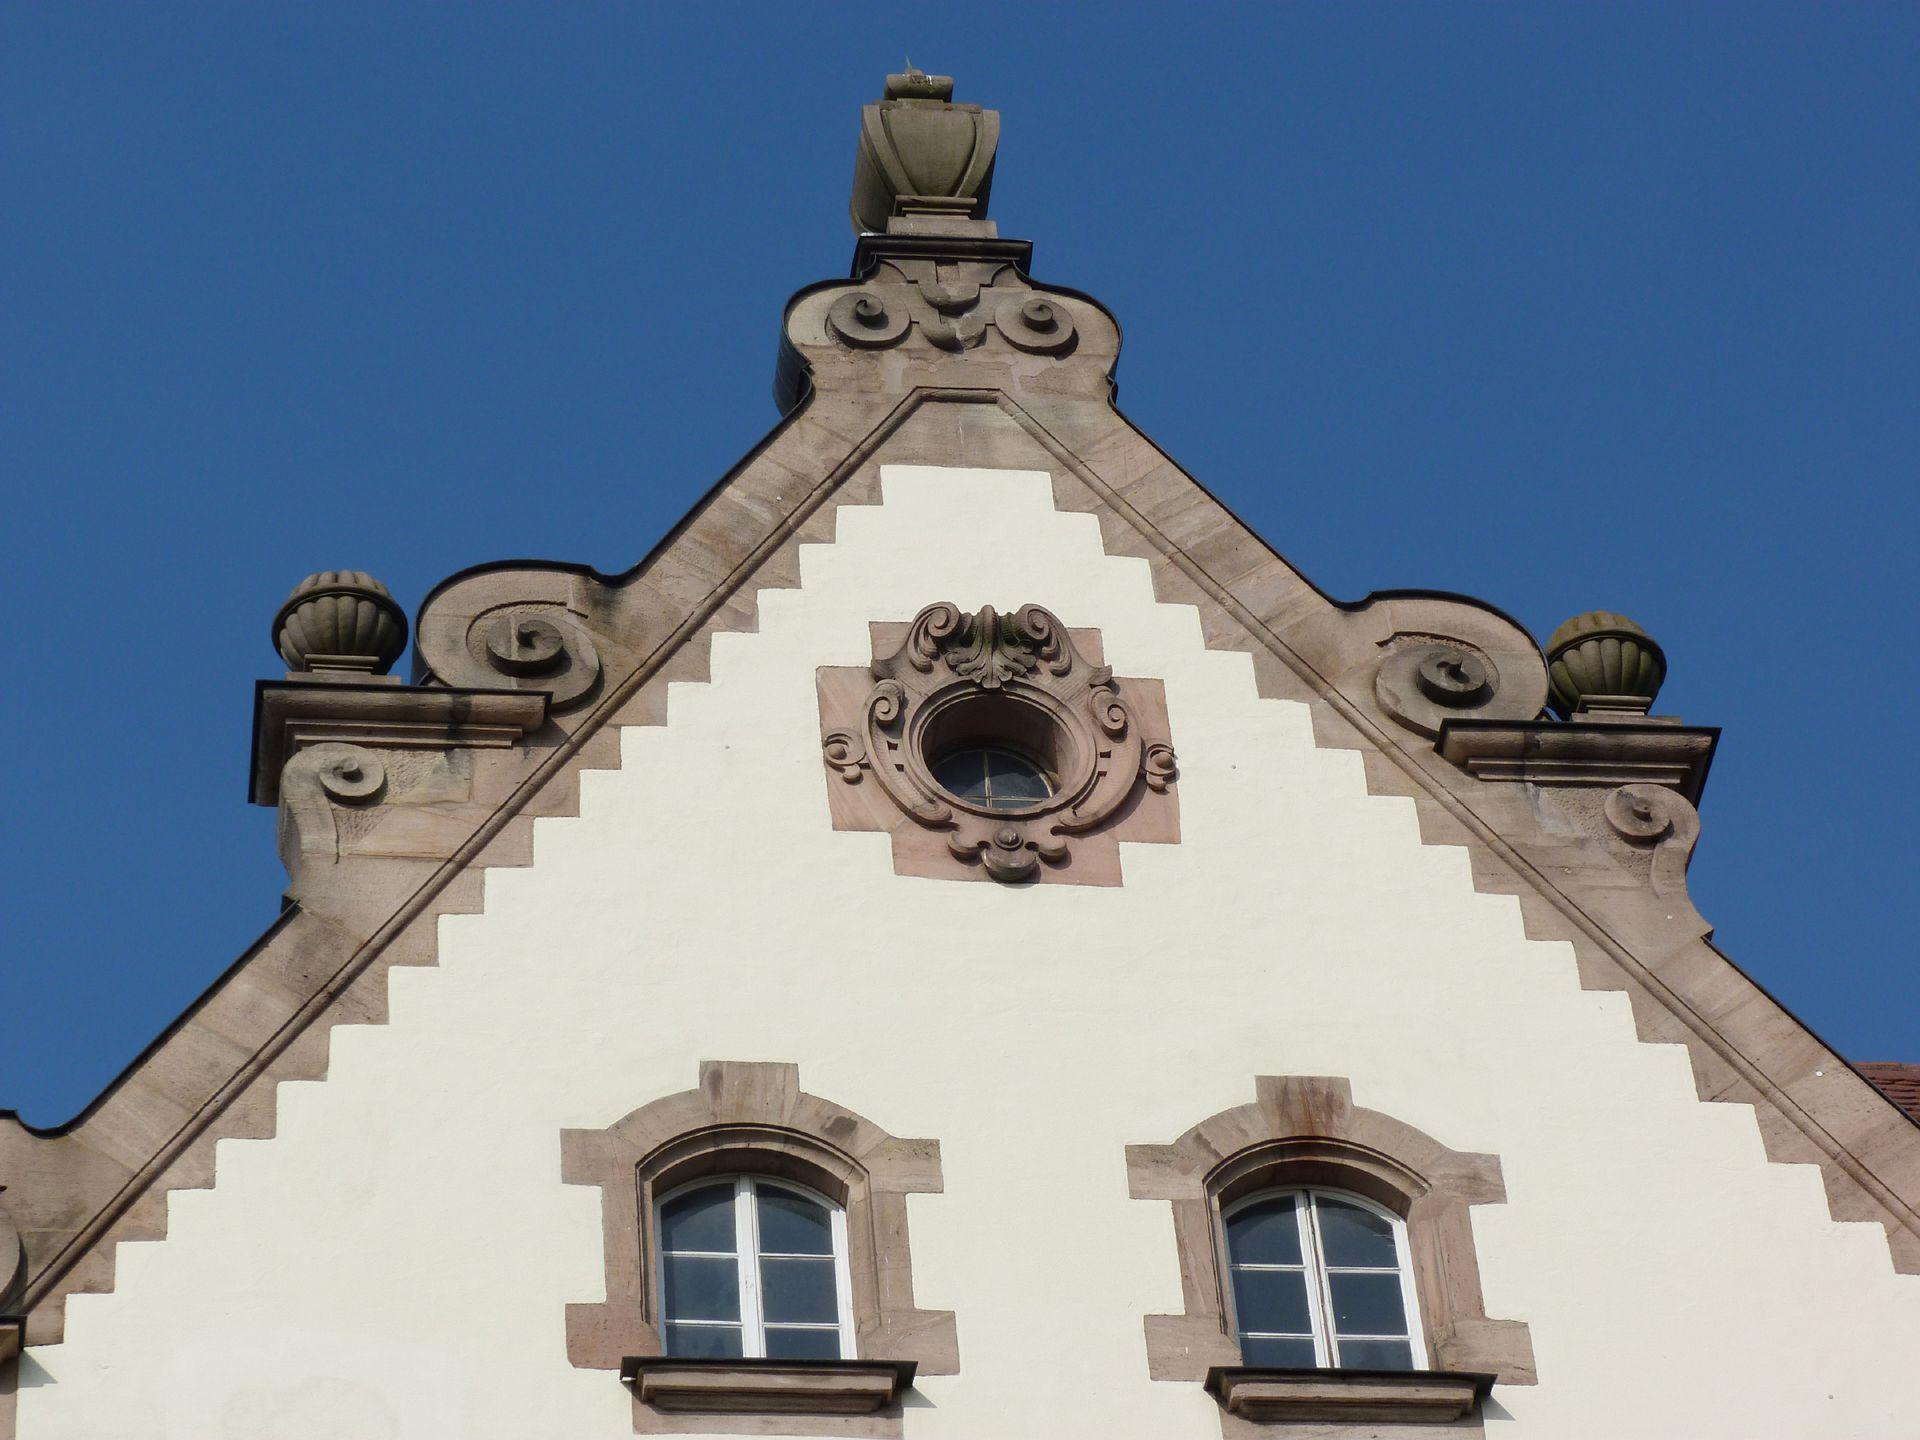 Johann-Daniel-Preißler-Schule Volutengiebel